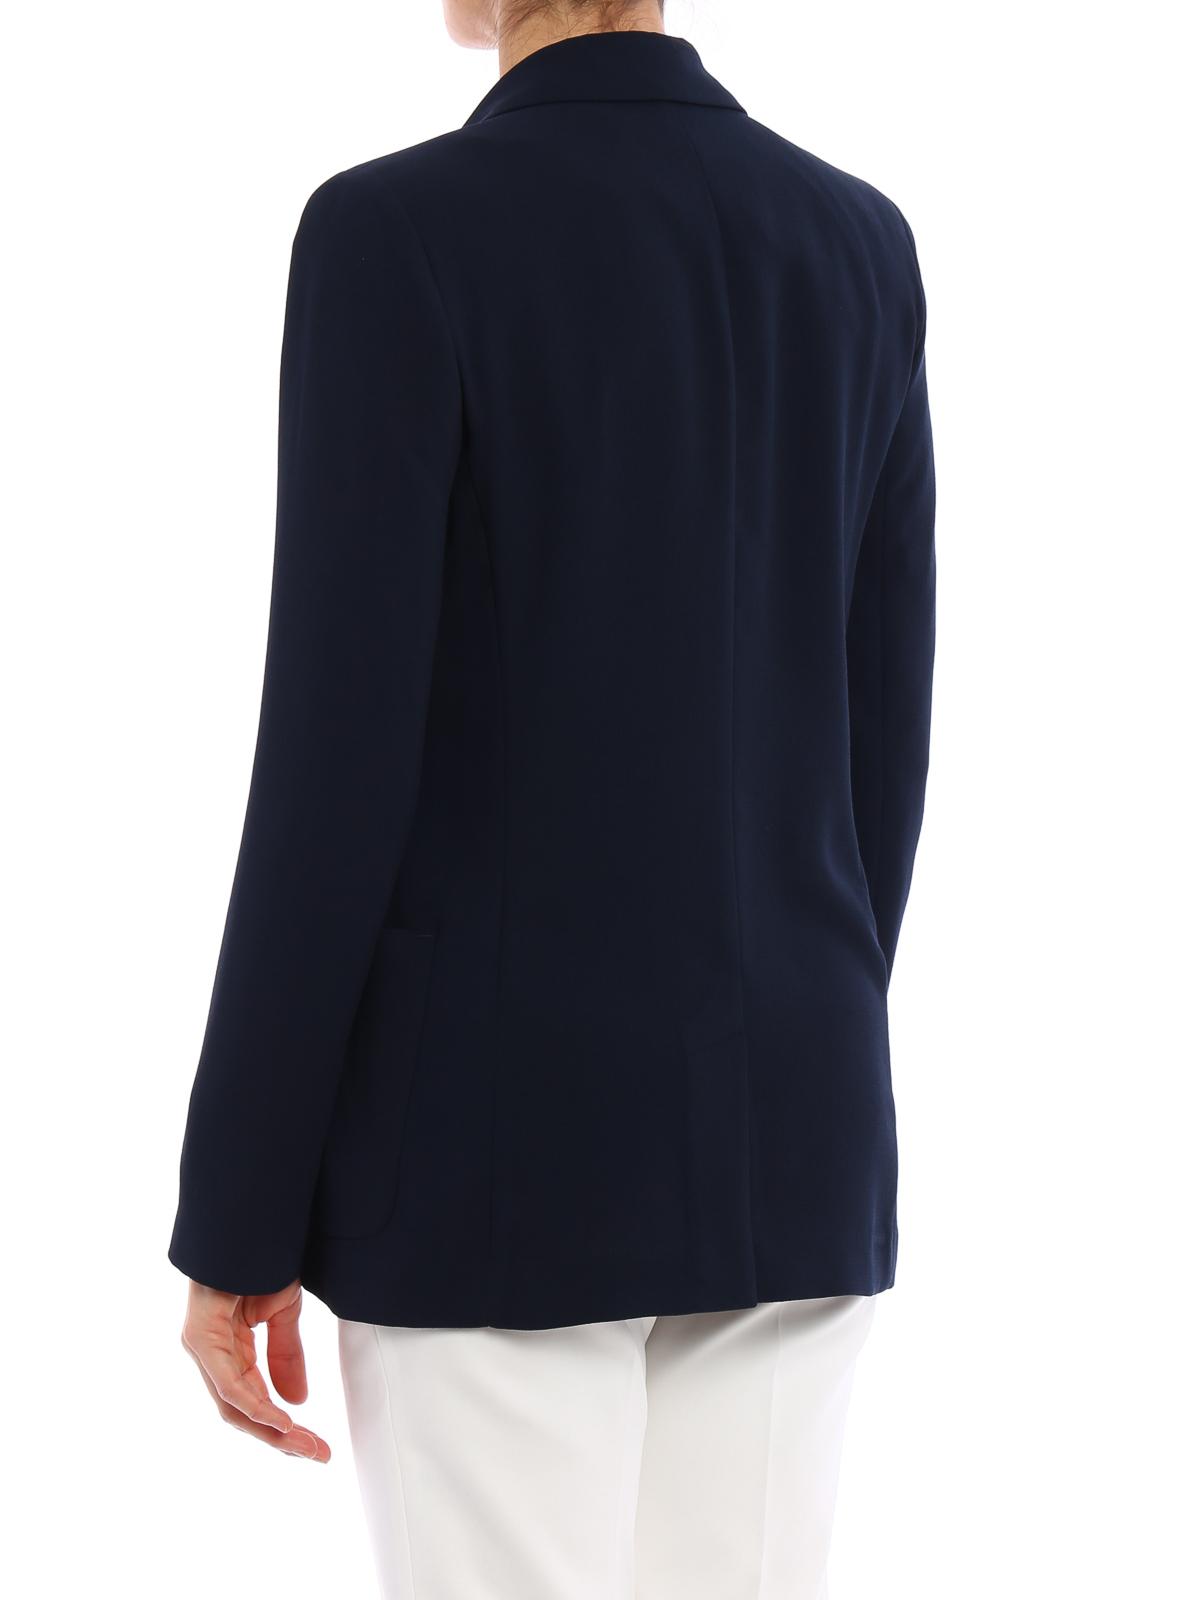 sports shoes f85ca bc77f Armani Jeans - Blazer Bleu Foncé - Vestes de costume ...